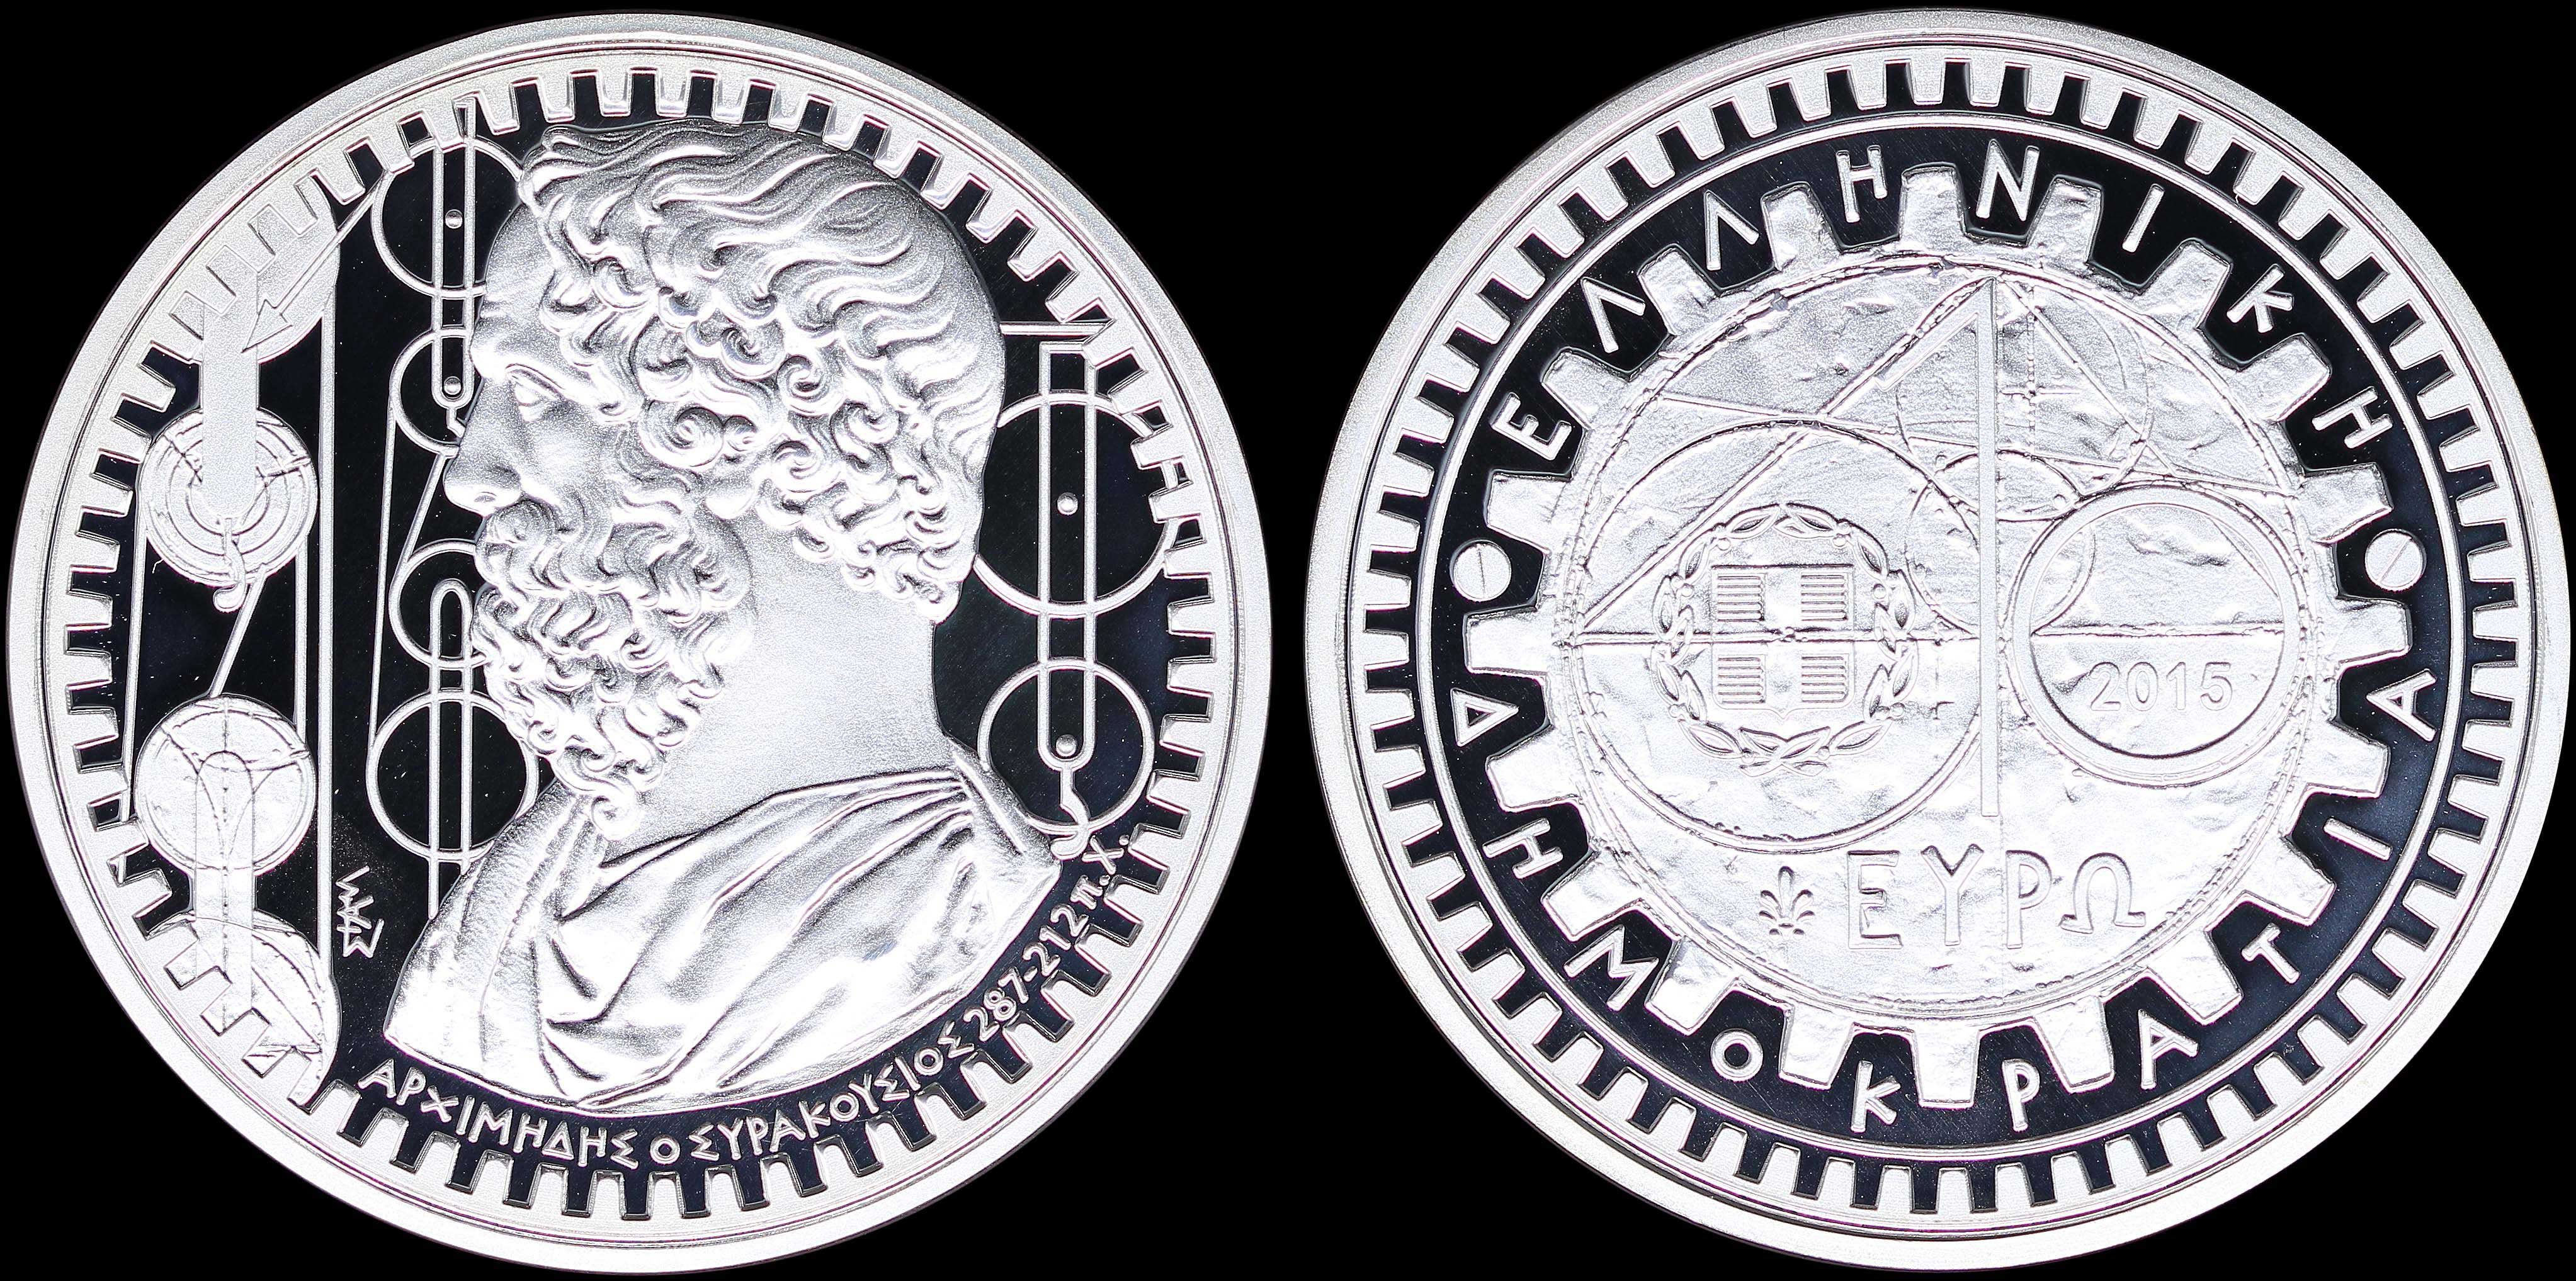 Lot 6267 - -  COINS & TOKENS HELLENIC REPUBLIC & COMMEMORATIVE ISSUES -  A. Karamitsos Public & Live Internet Auction 682 (Part A) Coins, Medals & Banknotes